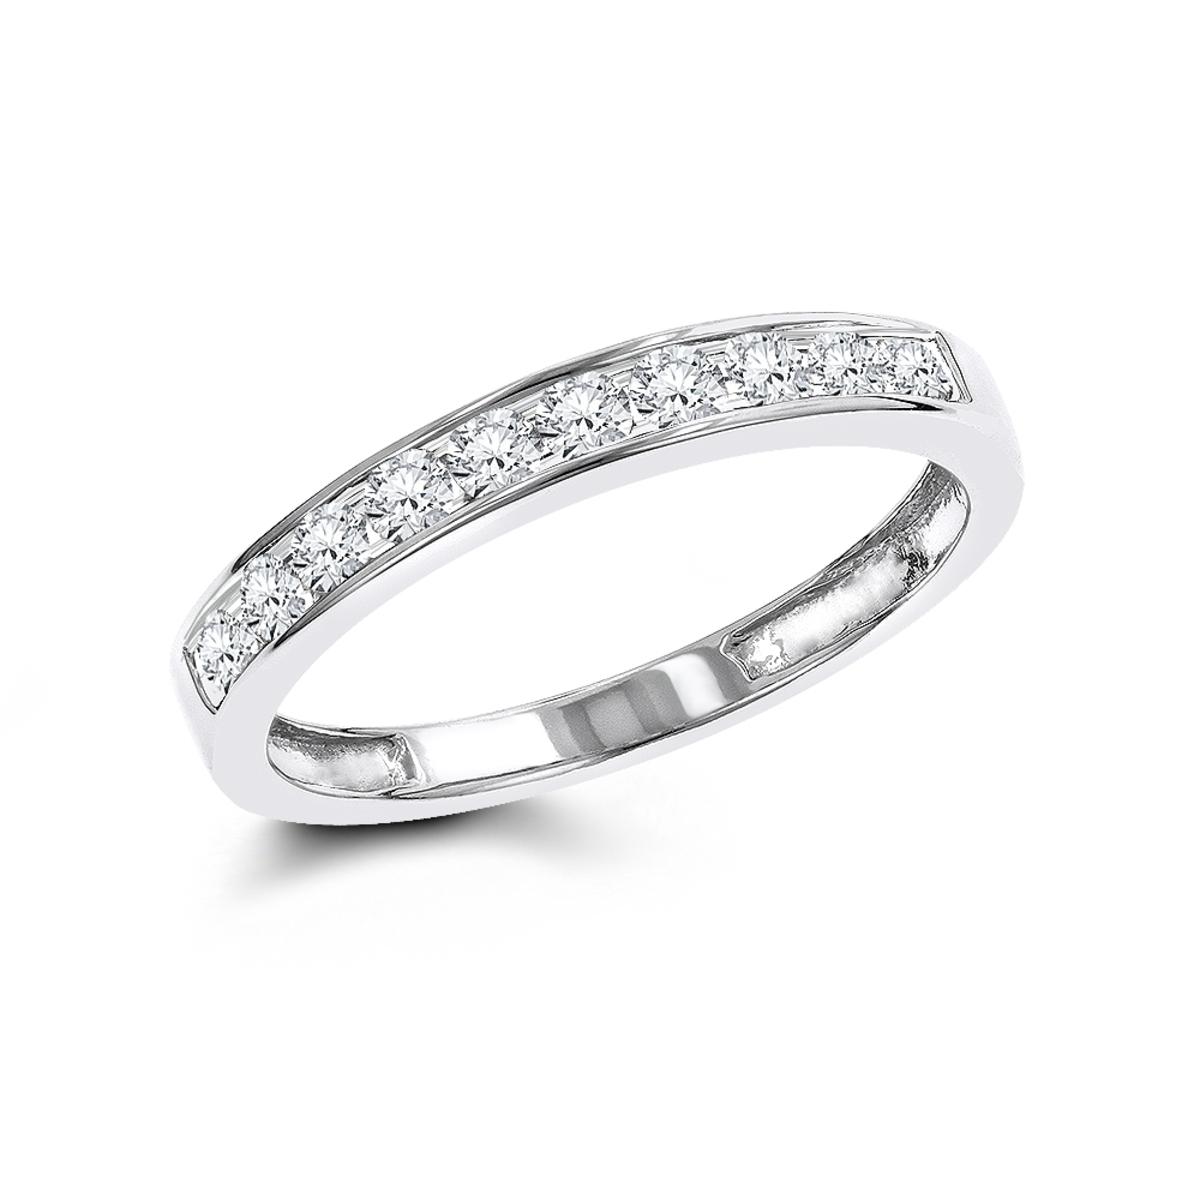 Thin 14K Gold Round Cut Womens Diamond Wedding Band Ring 0.36ct